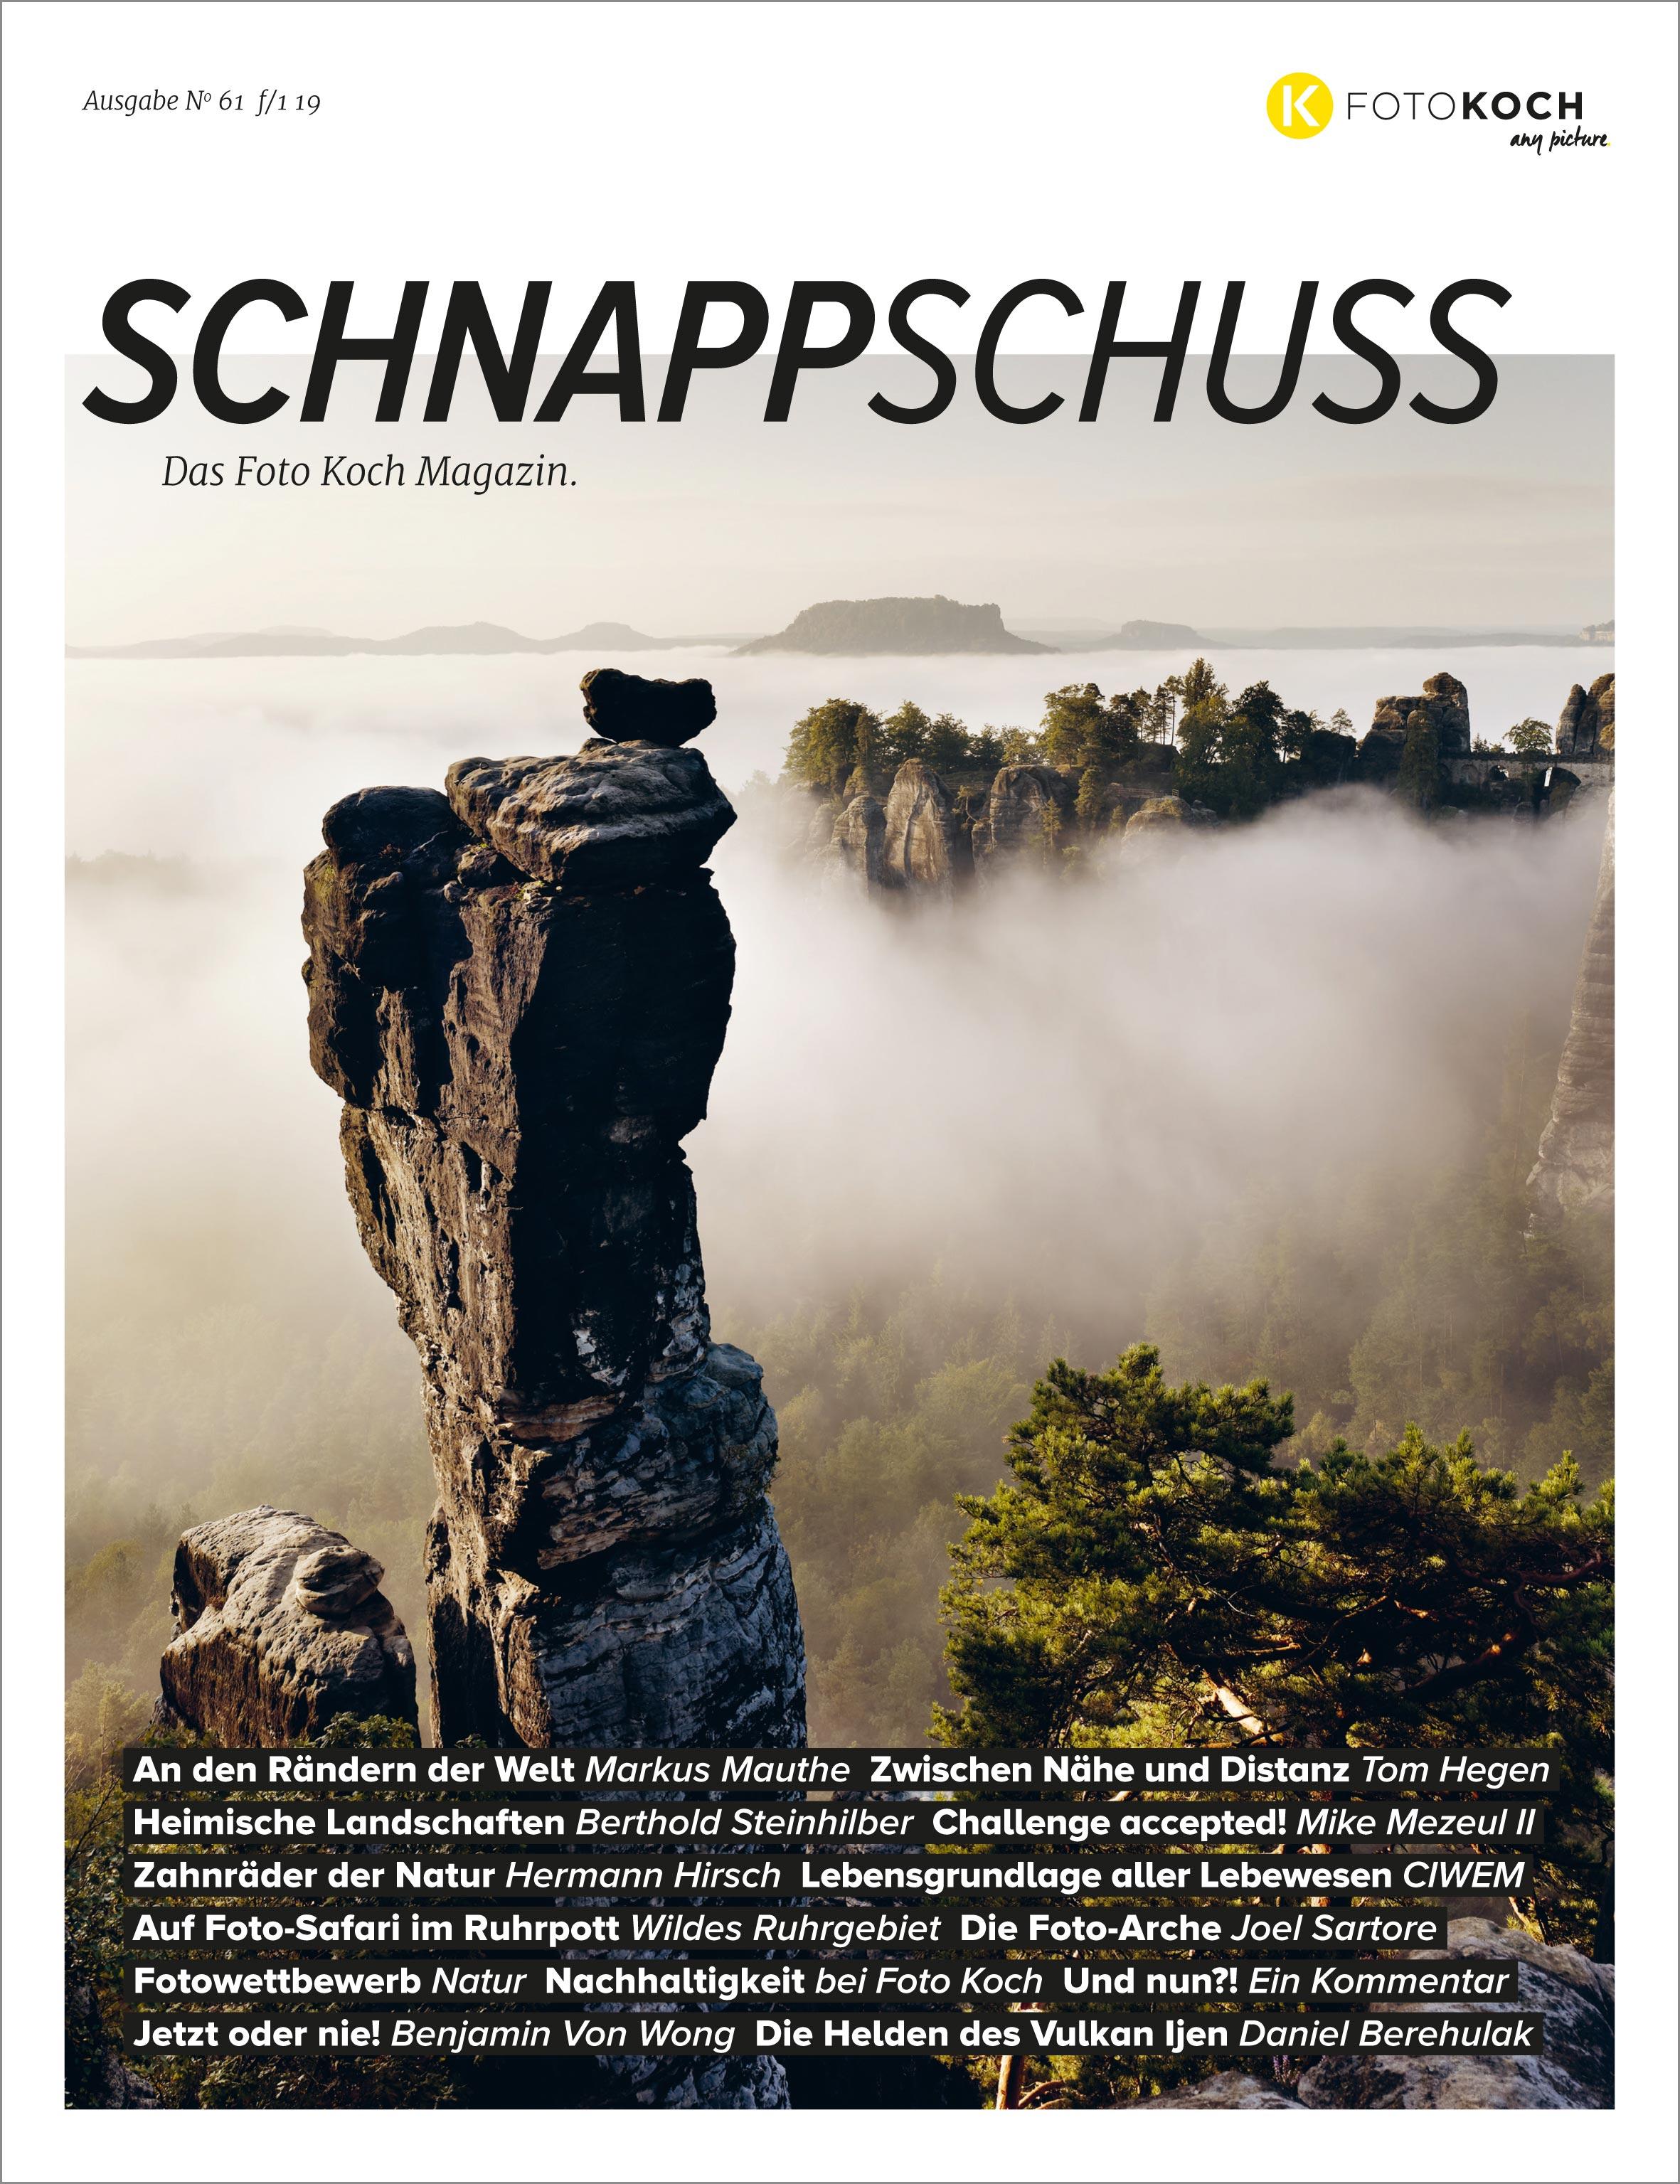 Schnappschuss No. 61 Natur